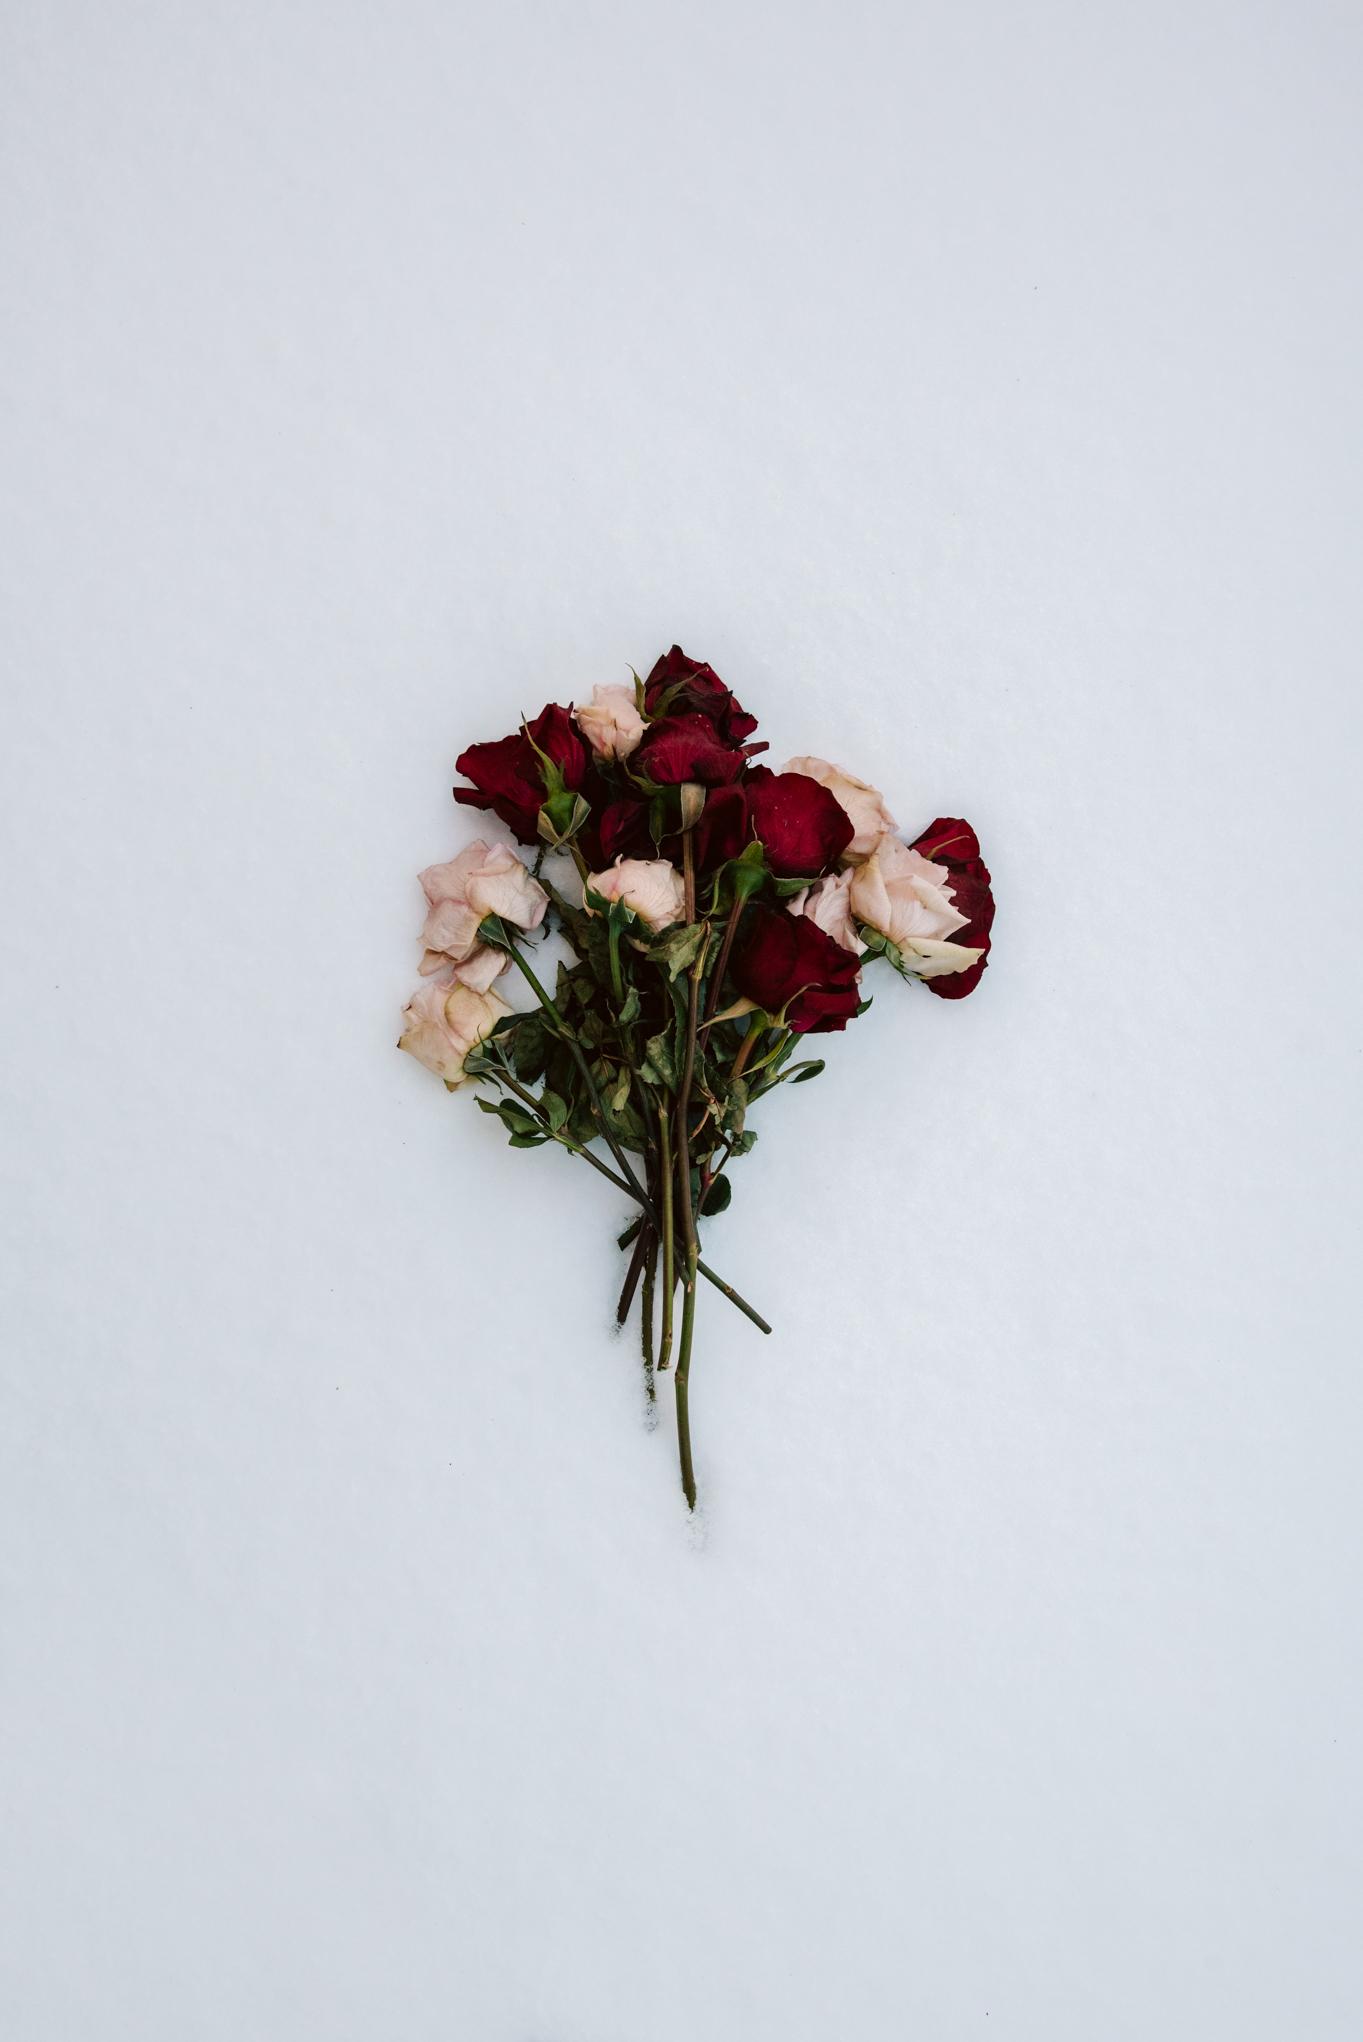 Roses in the Snow-1.jpg